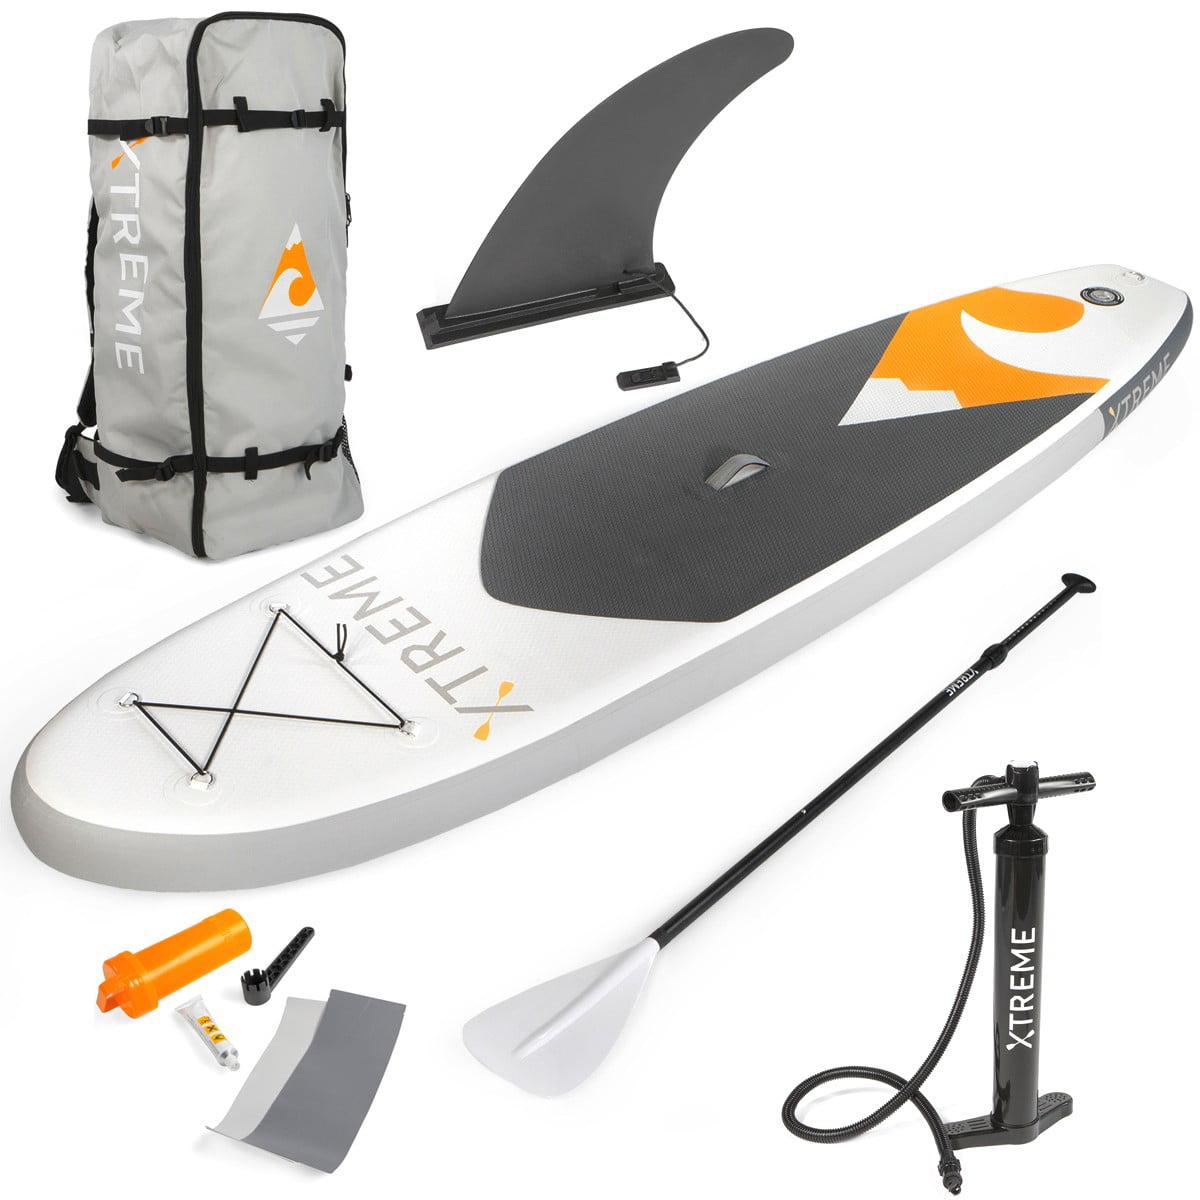 Xtreme 10ft Aqua SUP Paddle Board Inflatable StandUp PaddleBoard, Grey